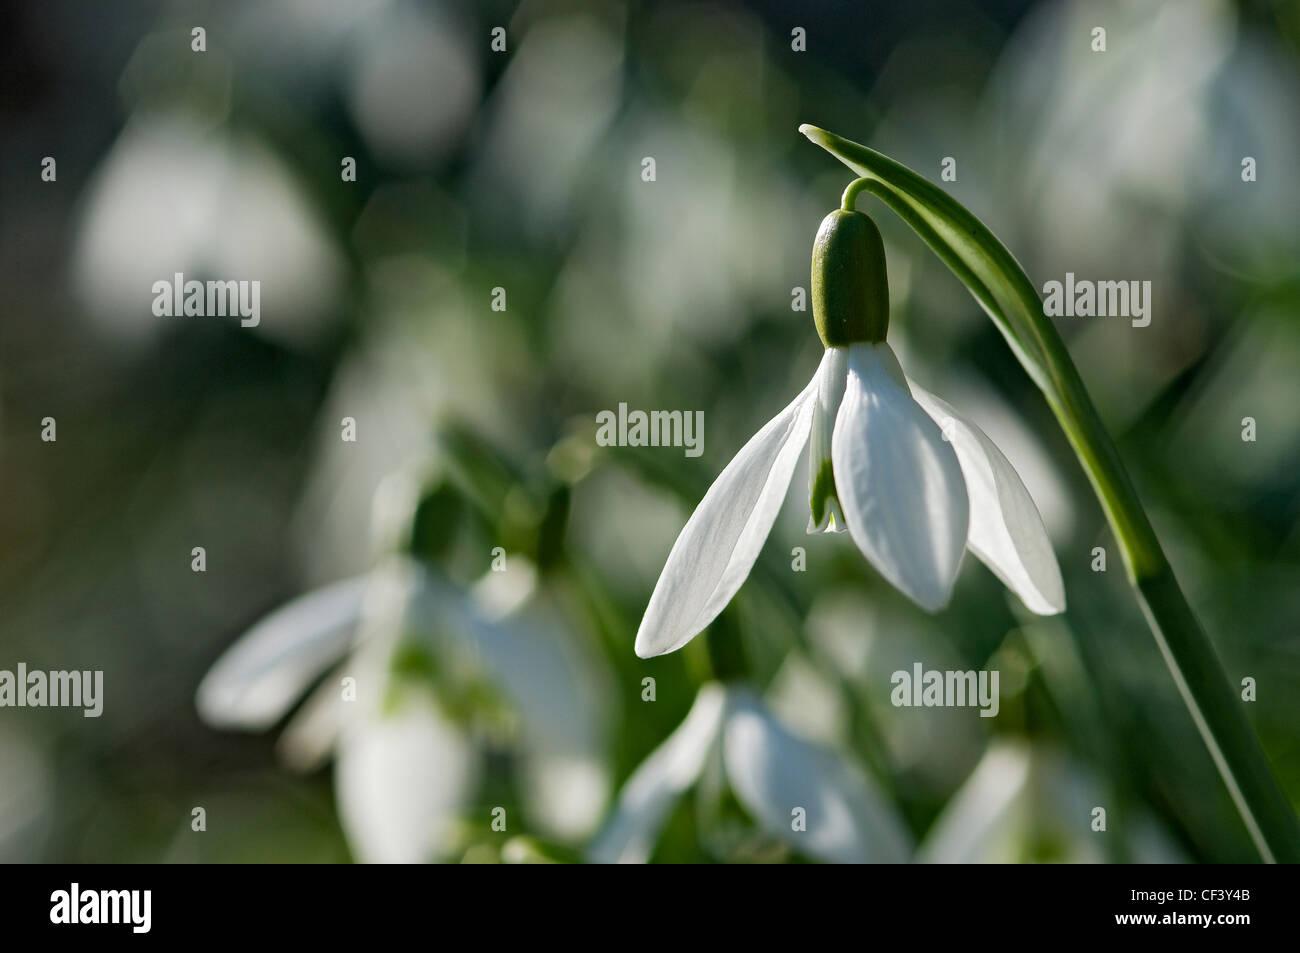 Close up of snowdrop (galanthus nivalis) in garden. - Stock Image